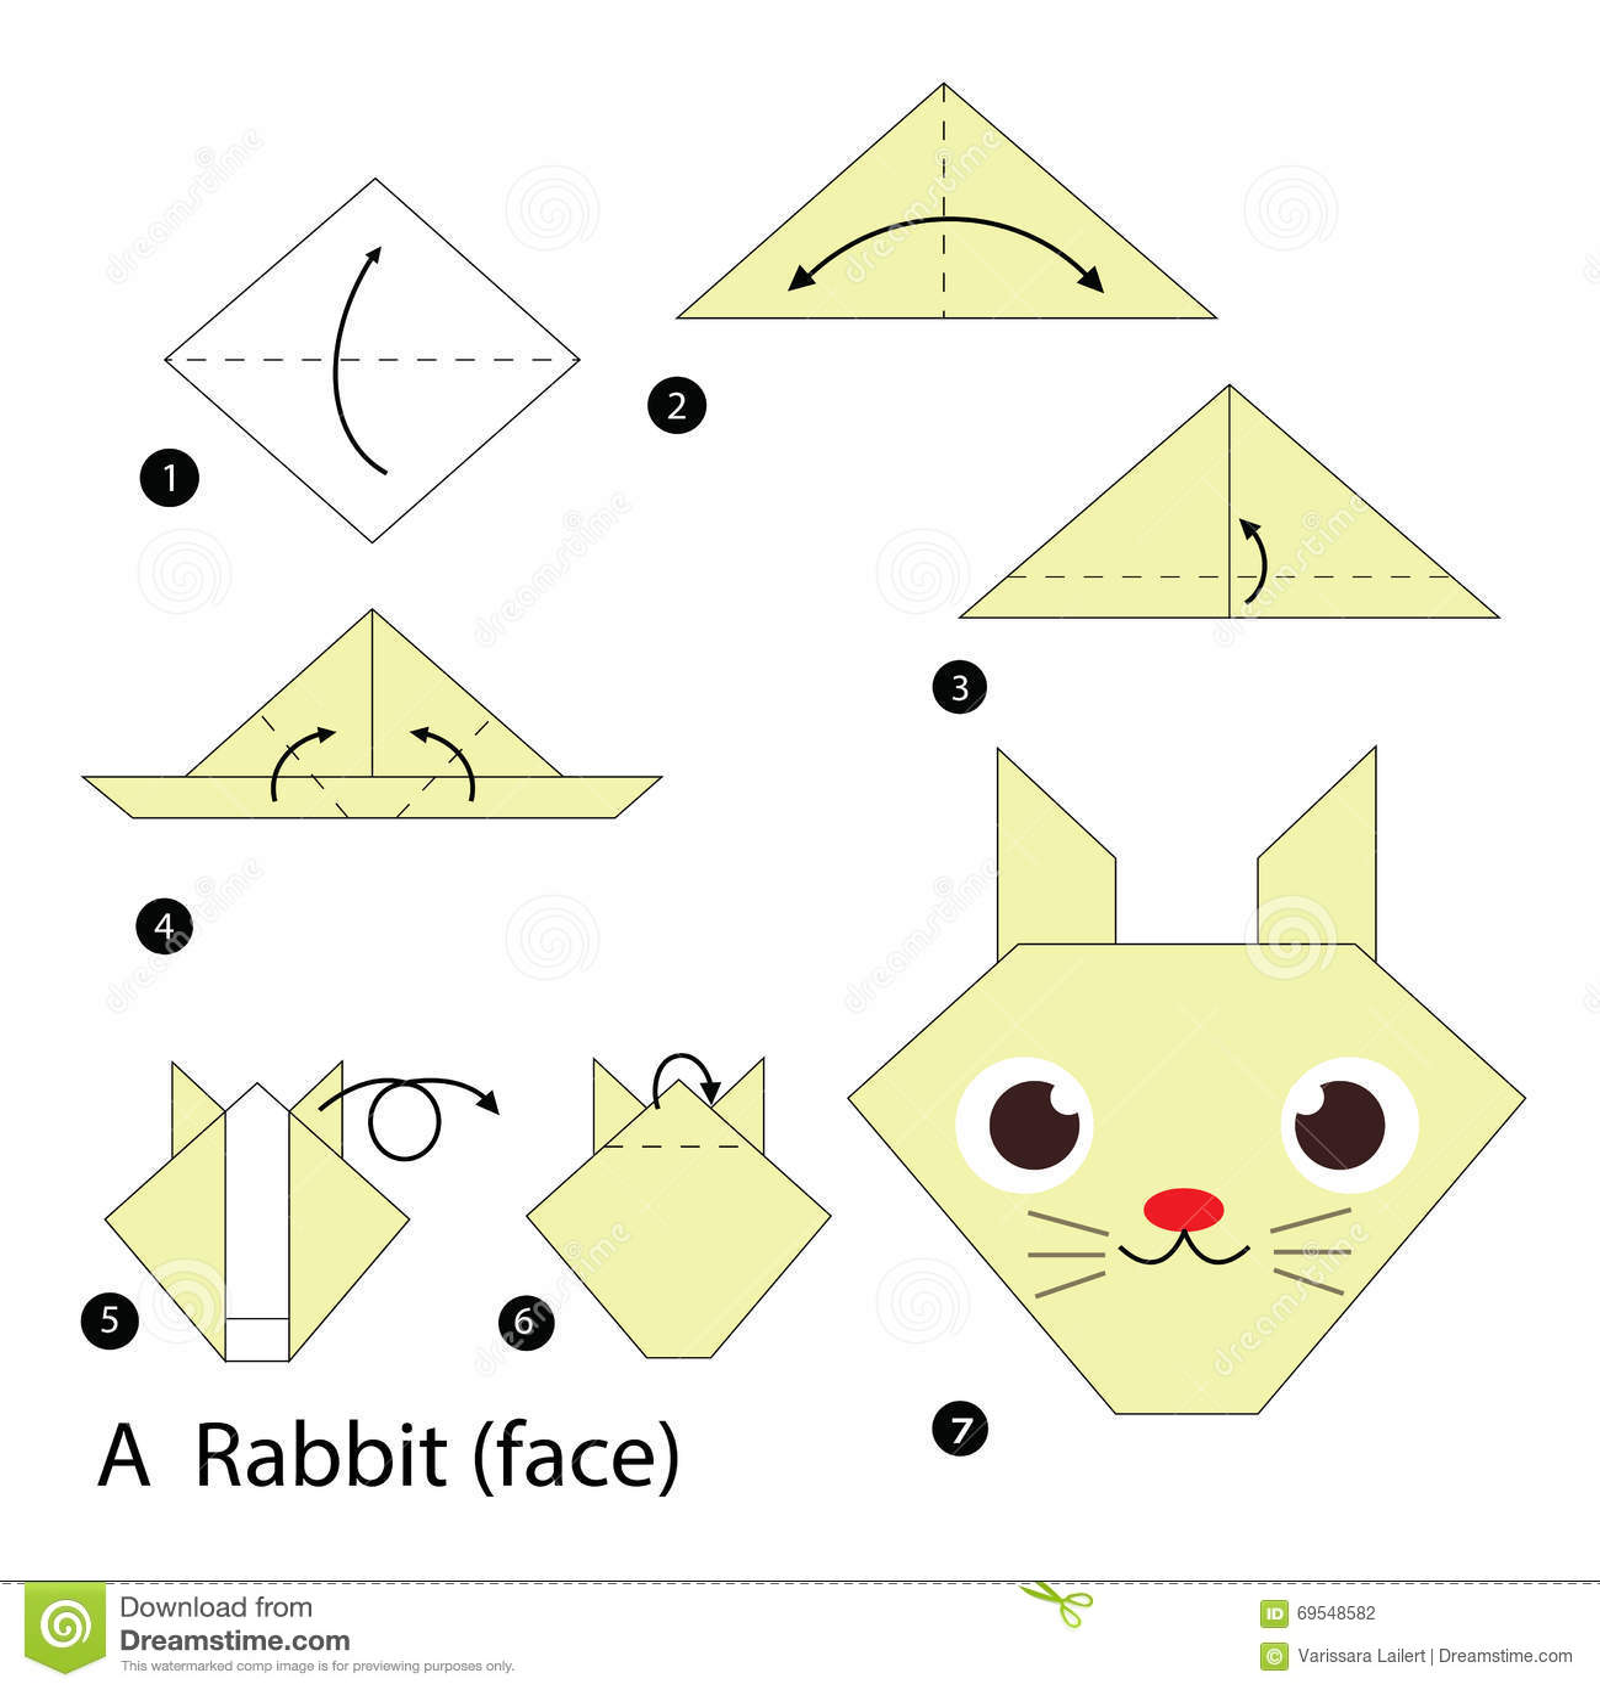 origami instructions | advanced origami bunny | Instruções origami ... | 1390x1300